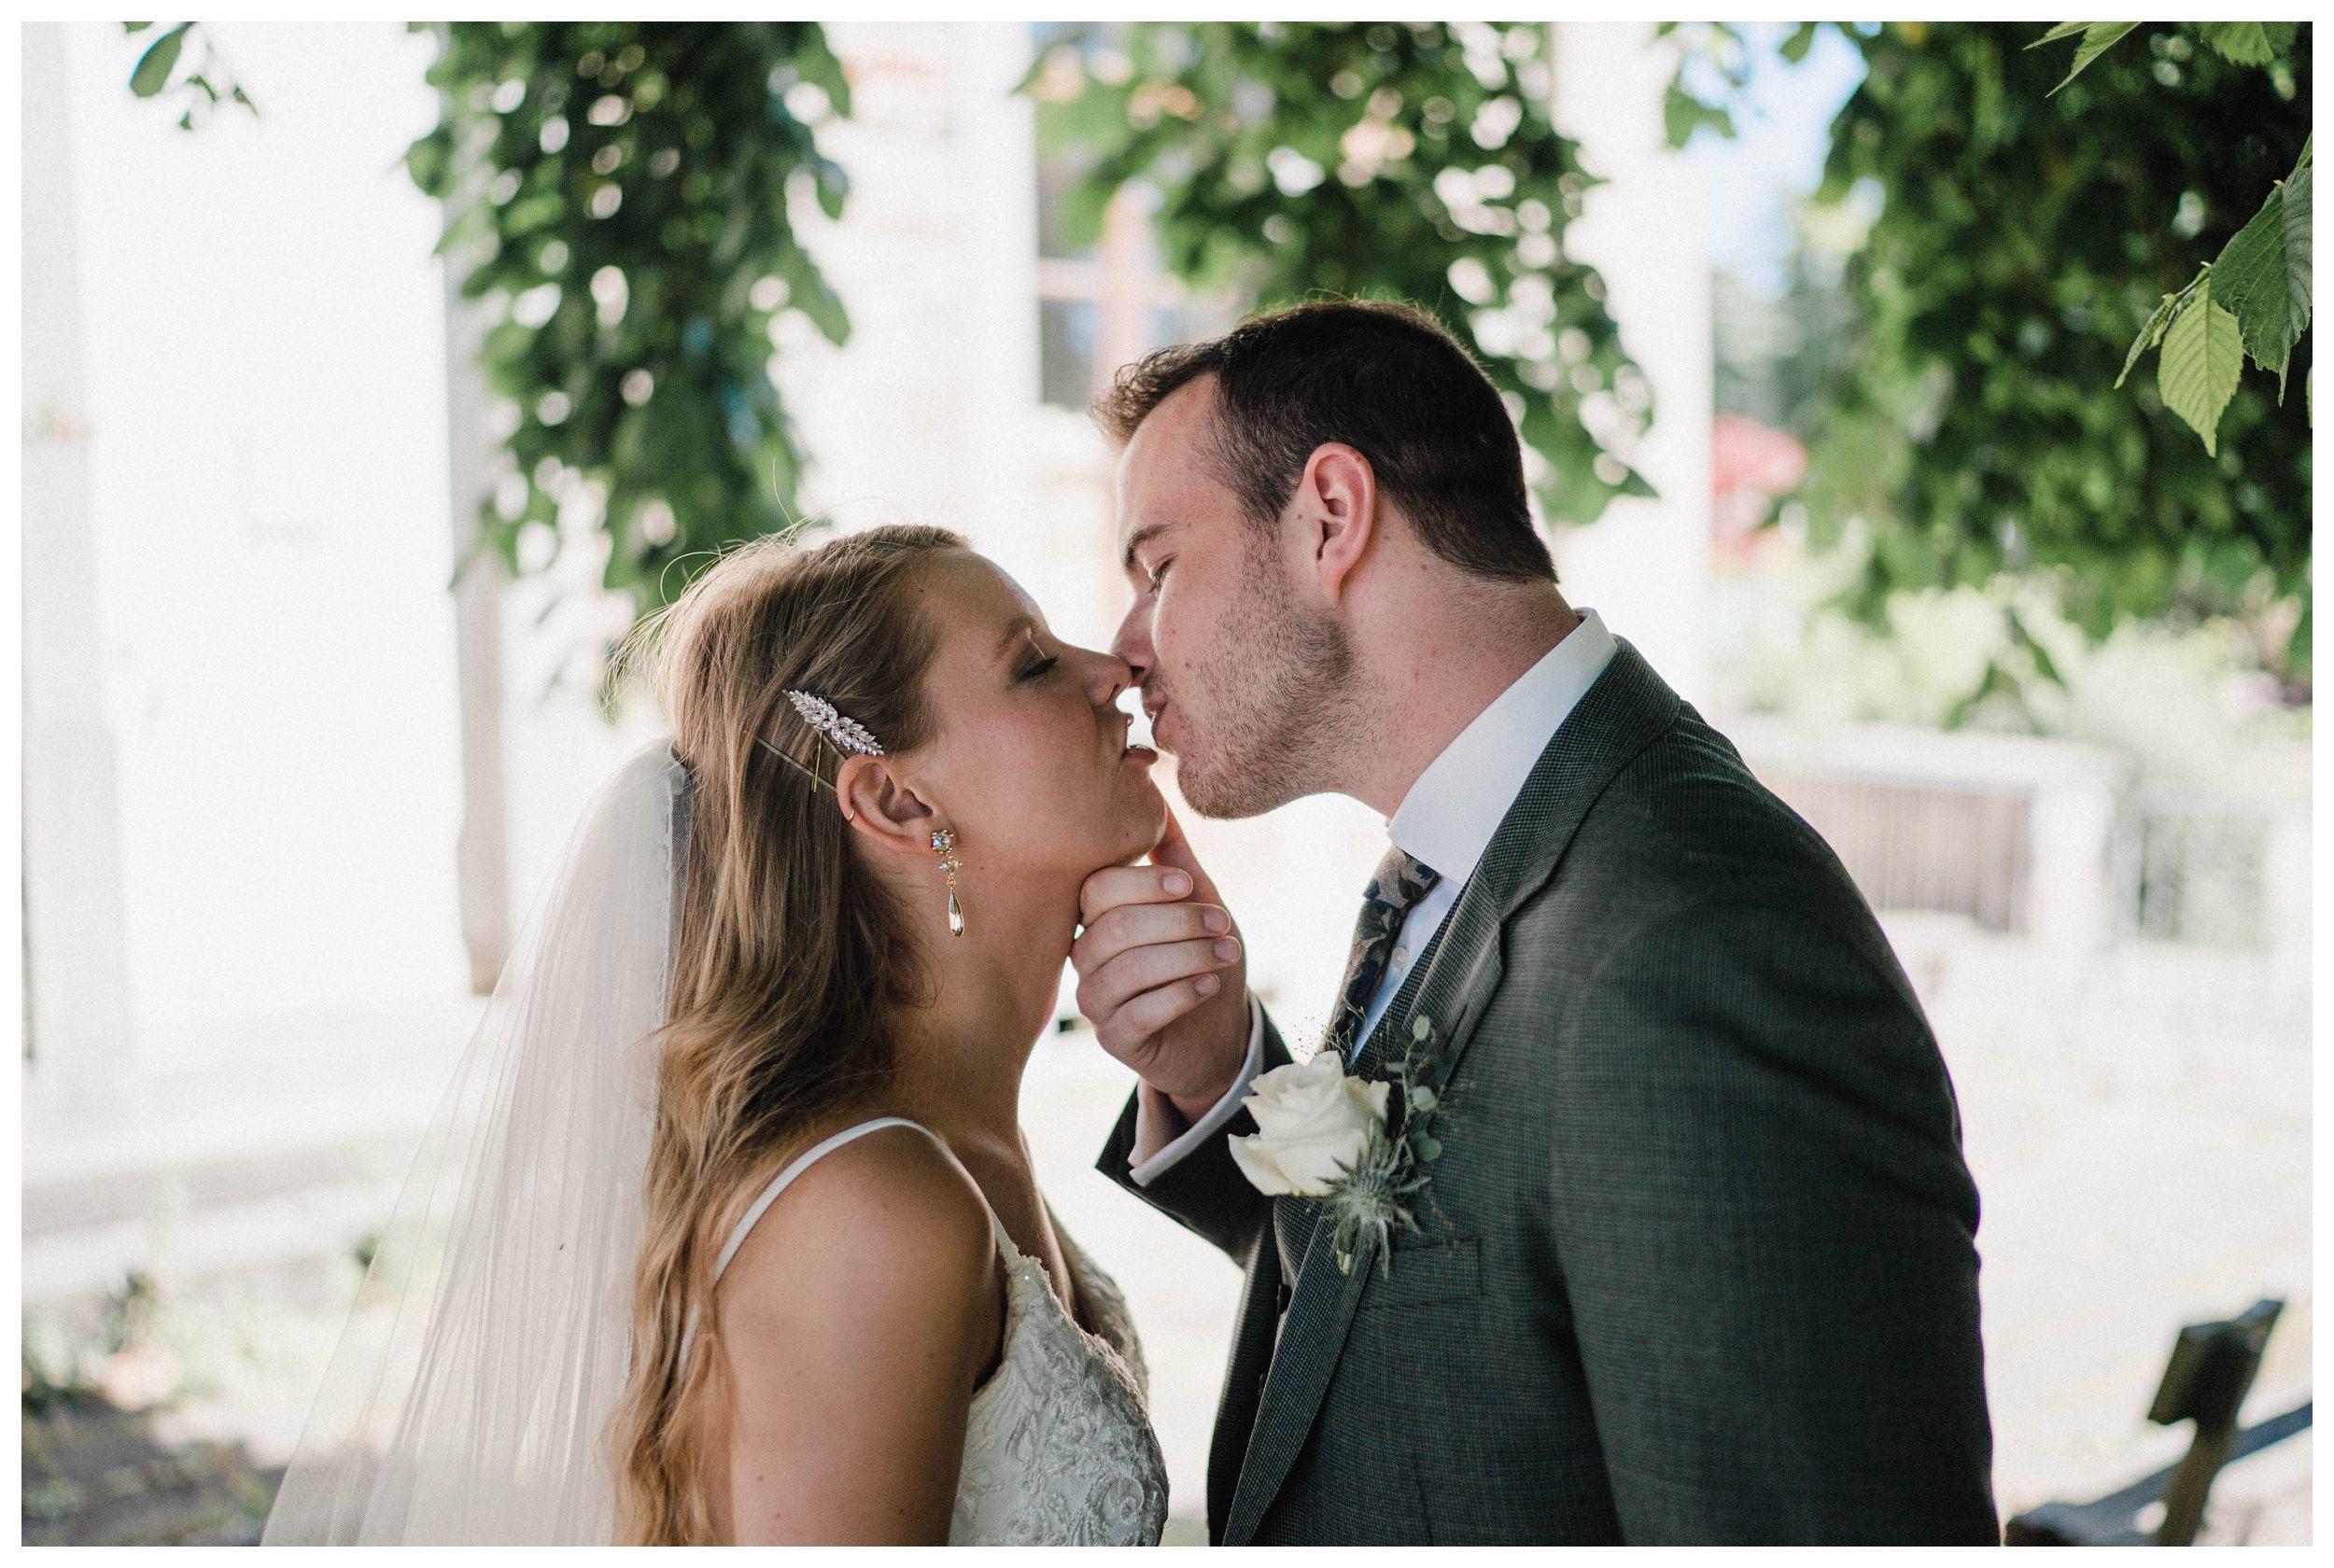 huwelijksfotograaf bruidsfotograaf destinationwedding huwelijksfotografie in ardennen nederland (56).jpg